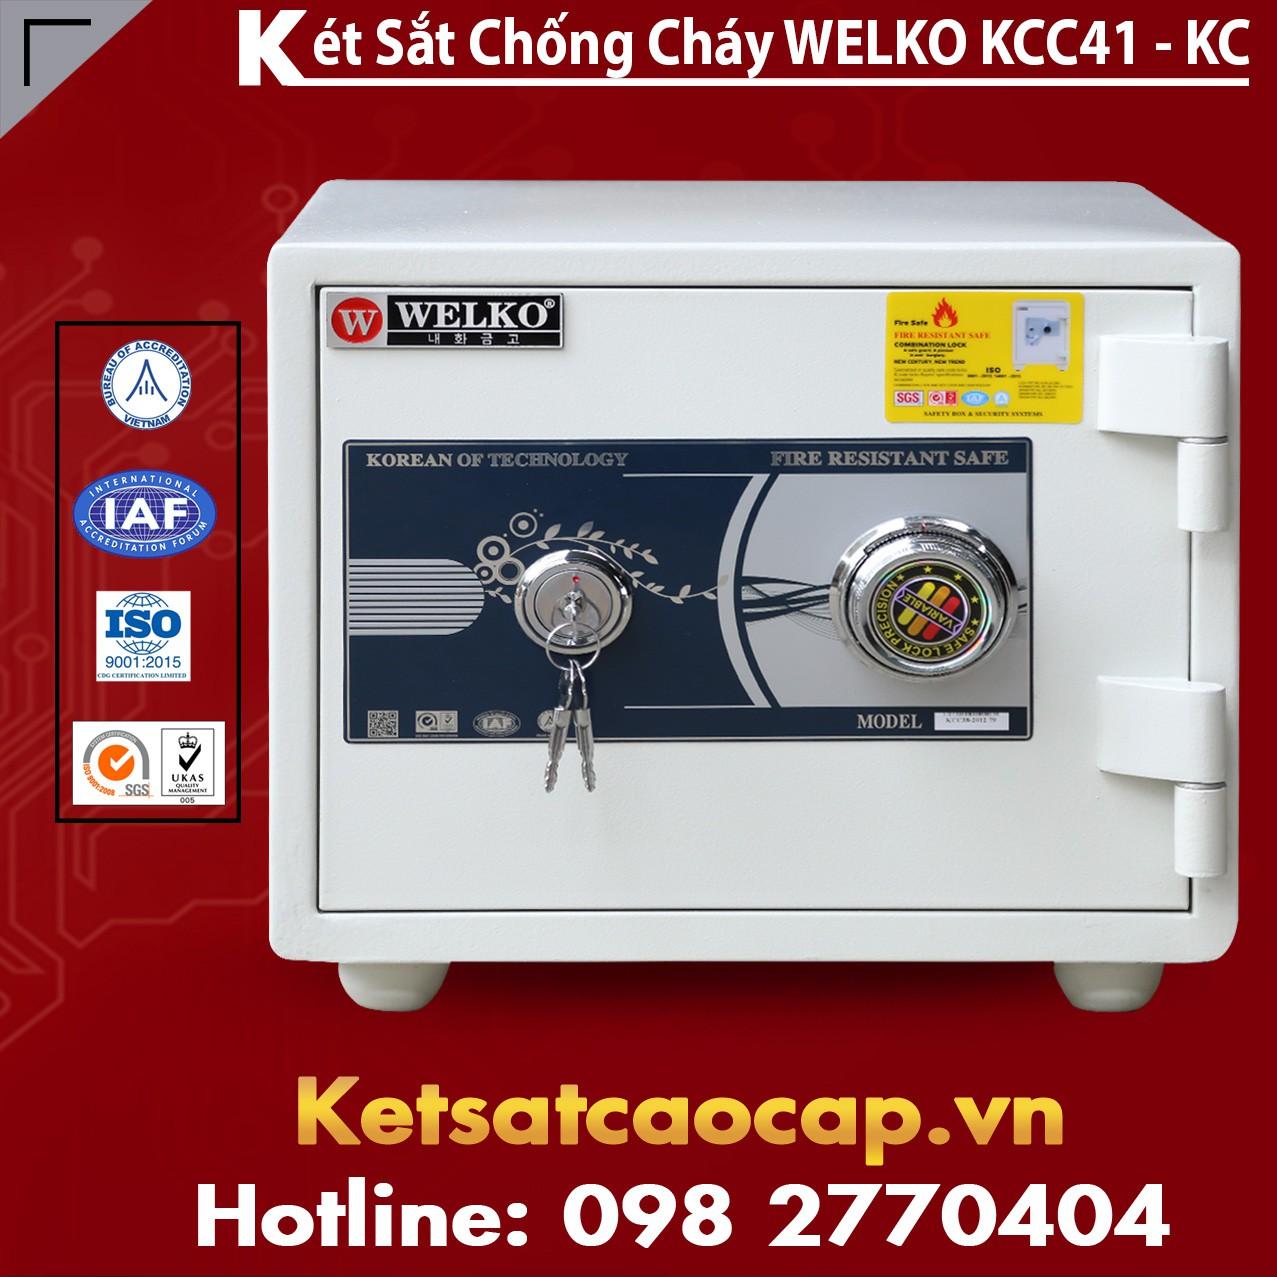 Mua Két Sắt KCC41 White - KC